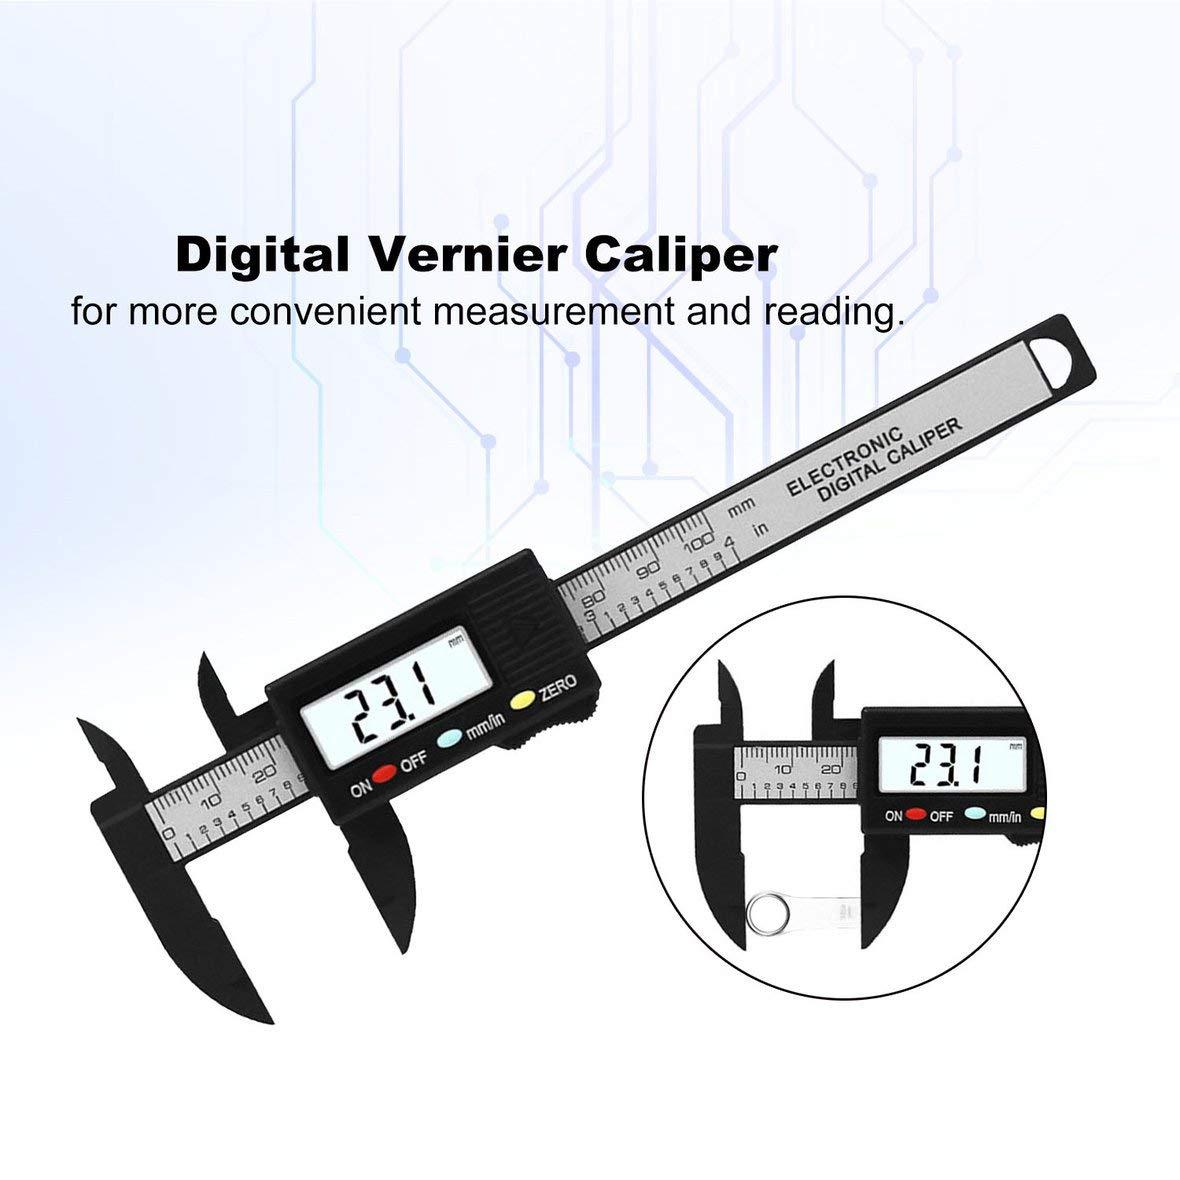 Mini Electronic Digital Caliper 0-100mm Messwerkzeug Digital Messschieber Mikrometer zur Schmuckmessung Schwarz